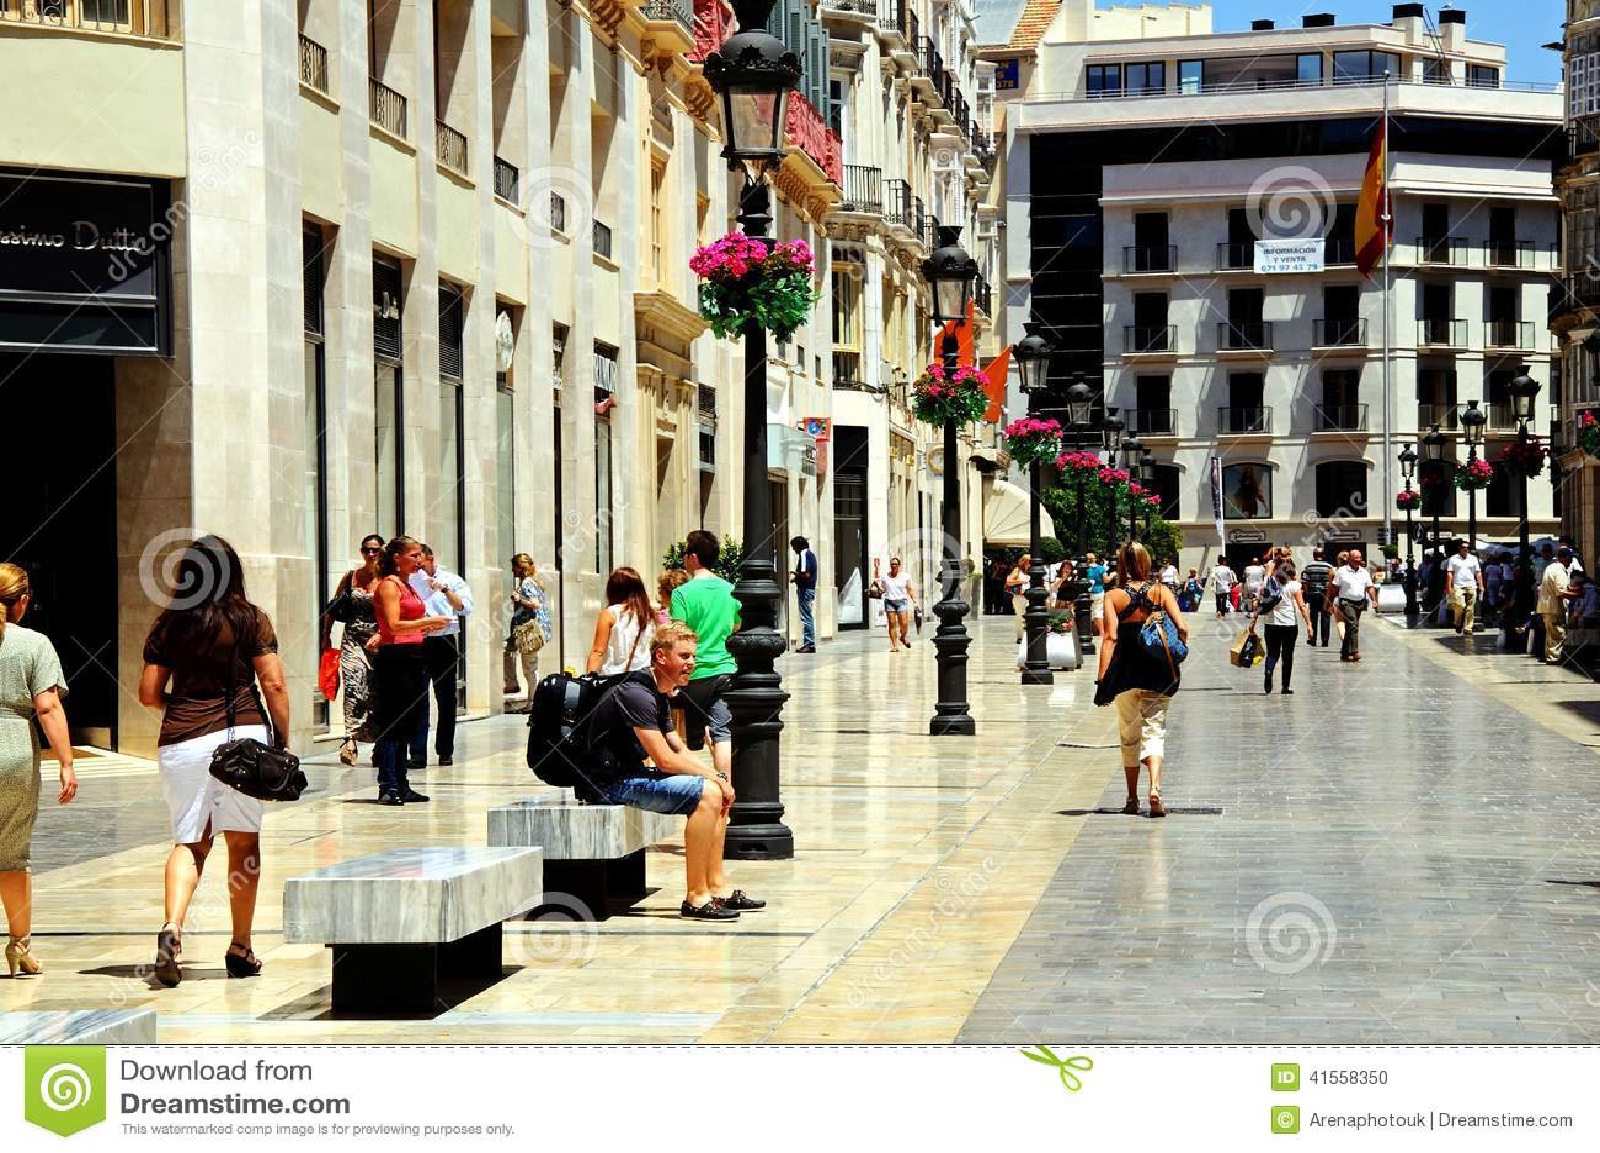 Calle larios malaga spain editorial image image 41558350 for Calle palma del rio malaga